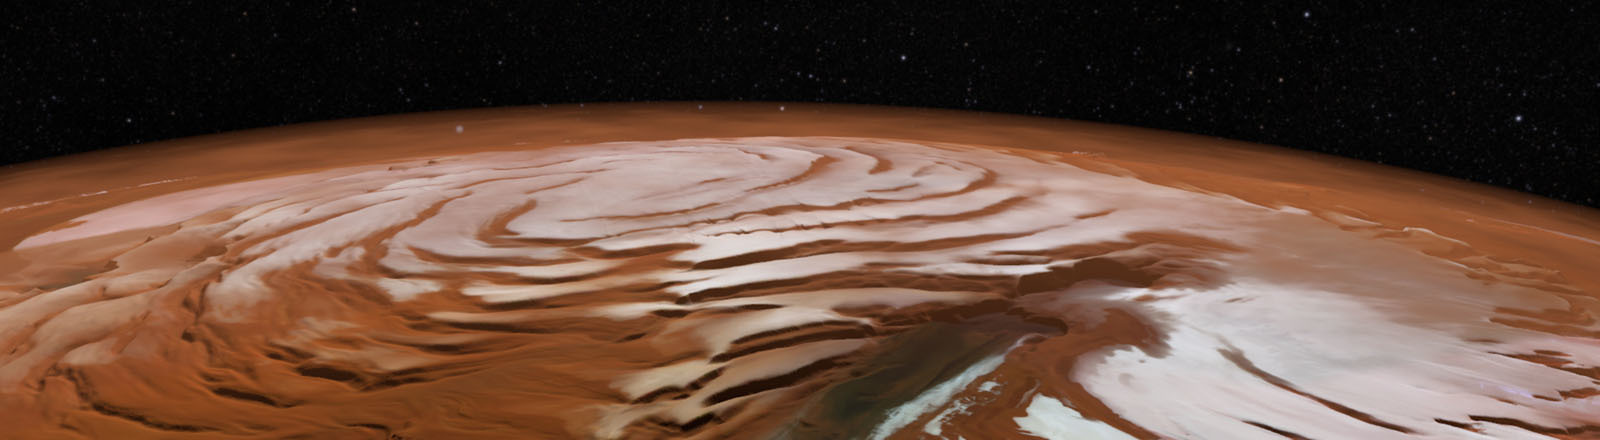 Eis auf dem Mars